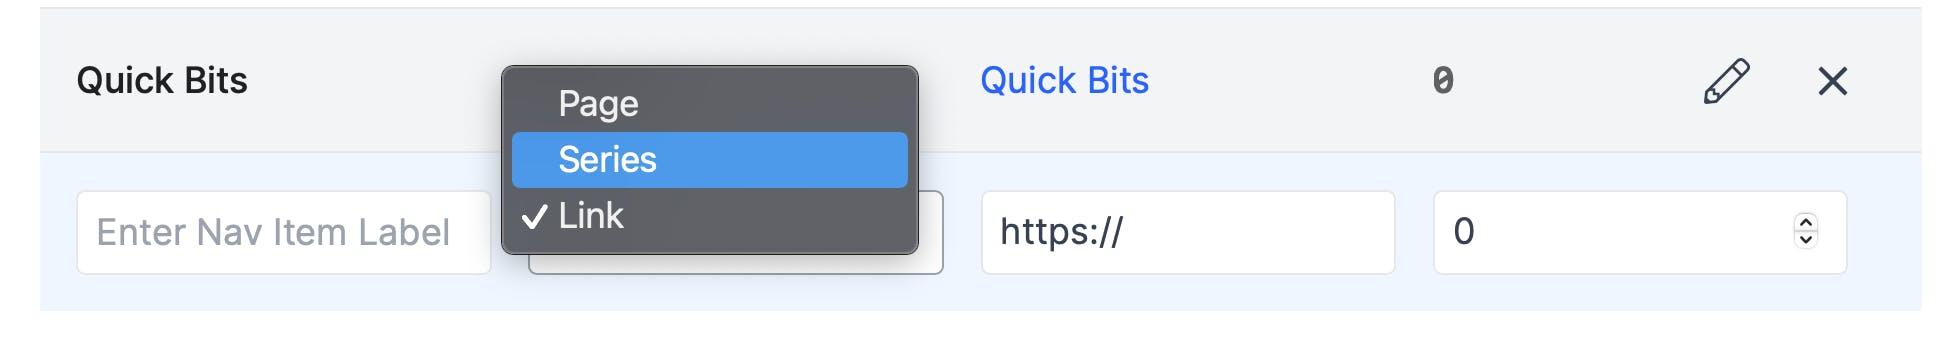 Example of navigation bar item